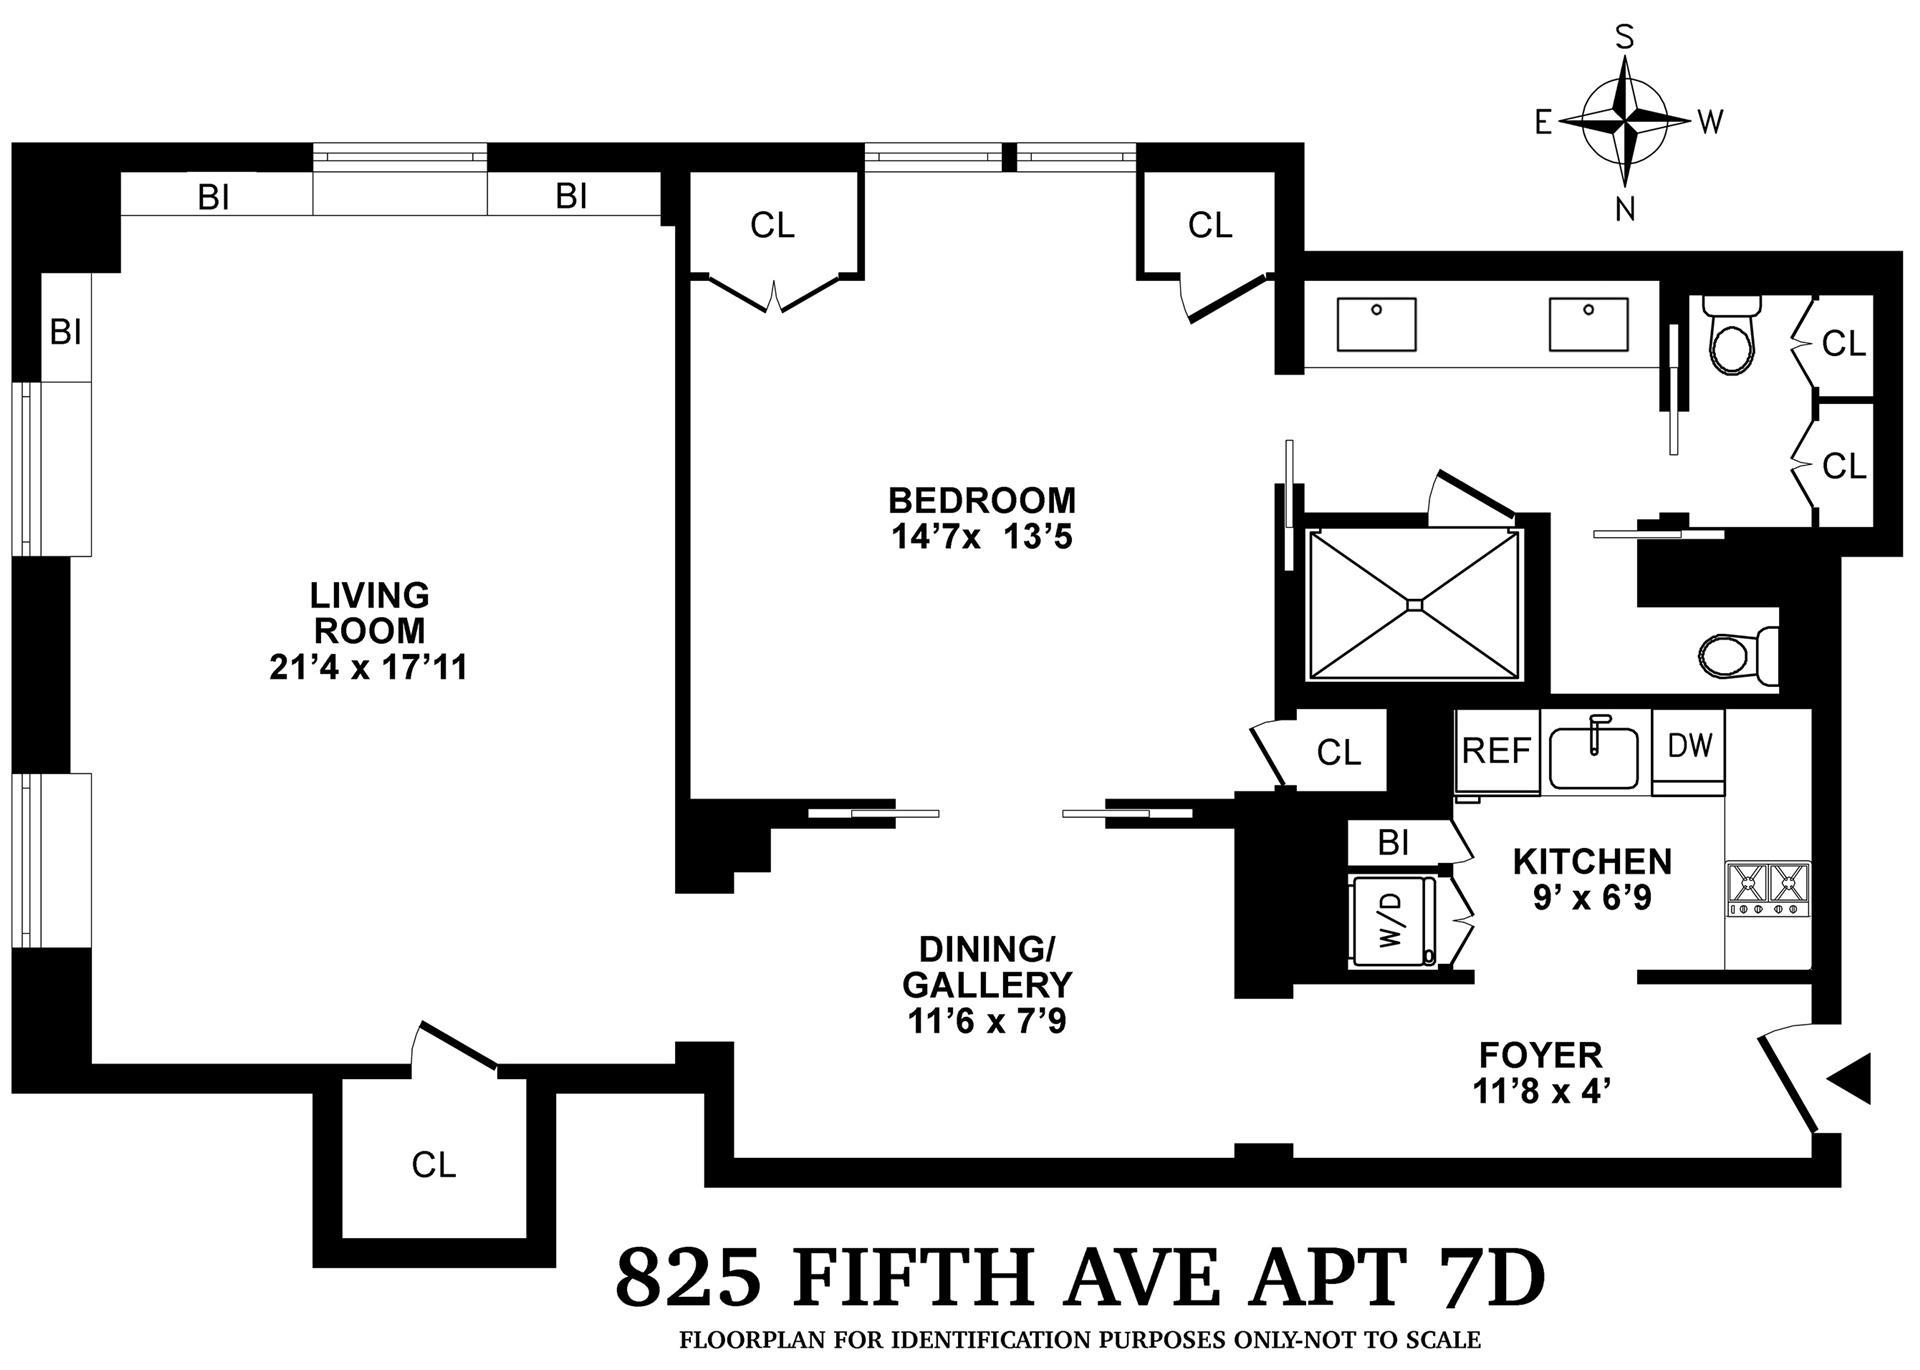 Floor plan of 825 Fifth Avenue, 7D - Upper East Side, New York